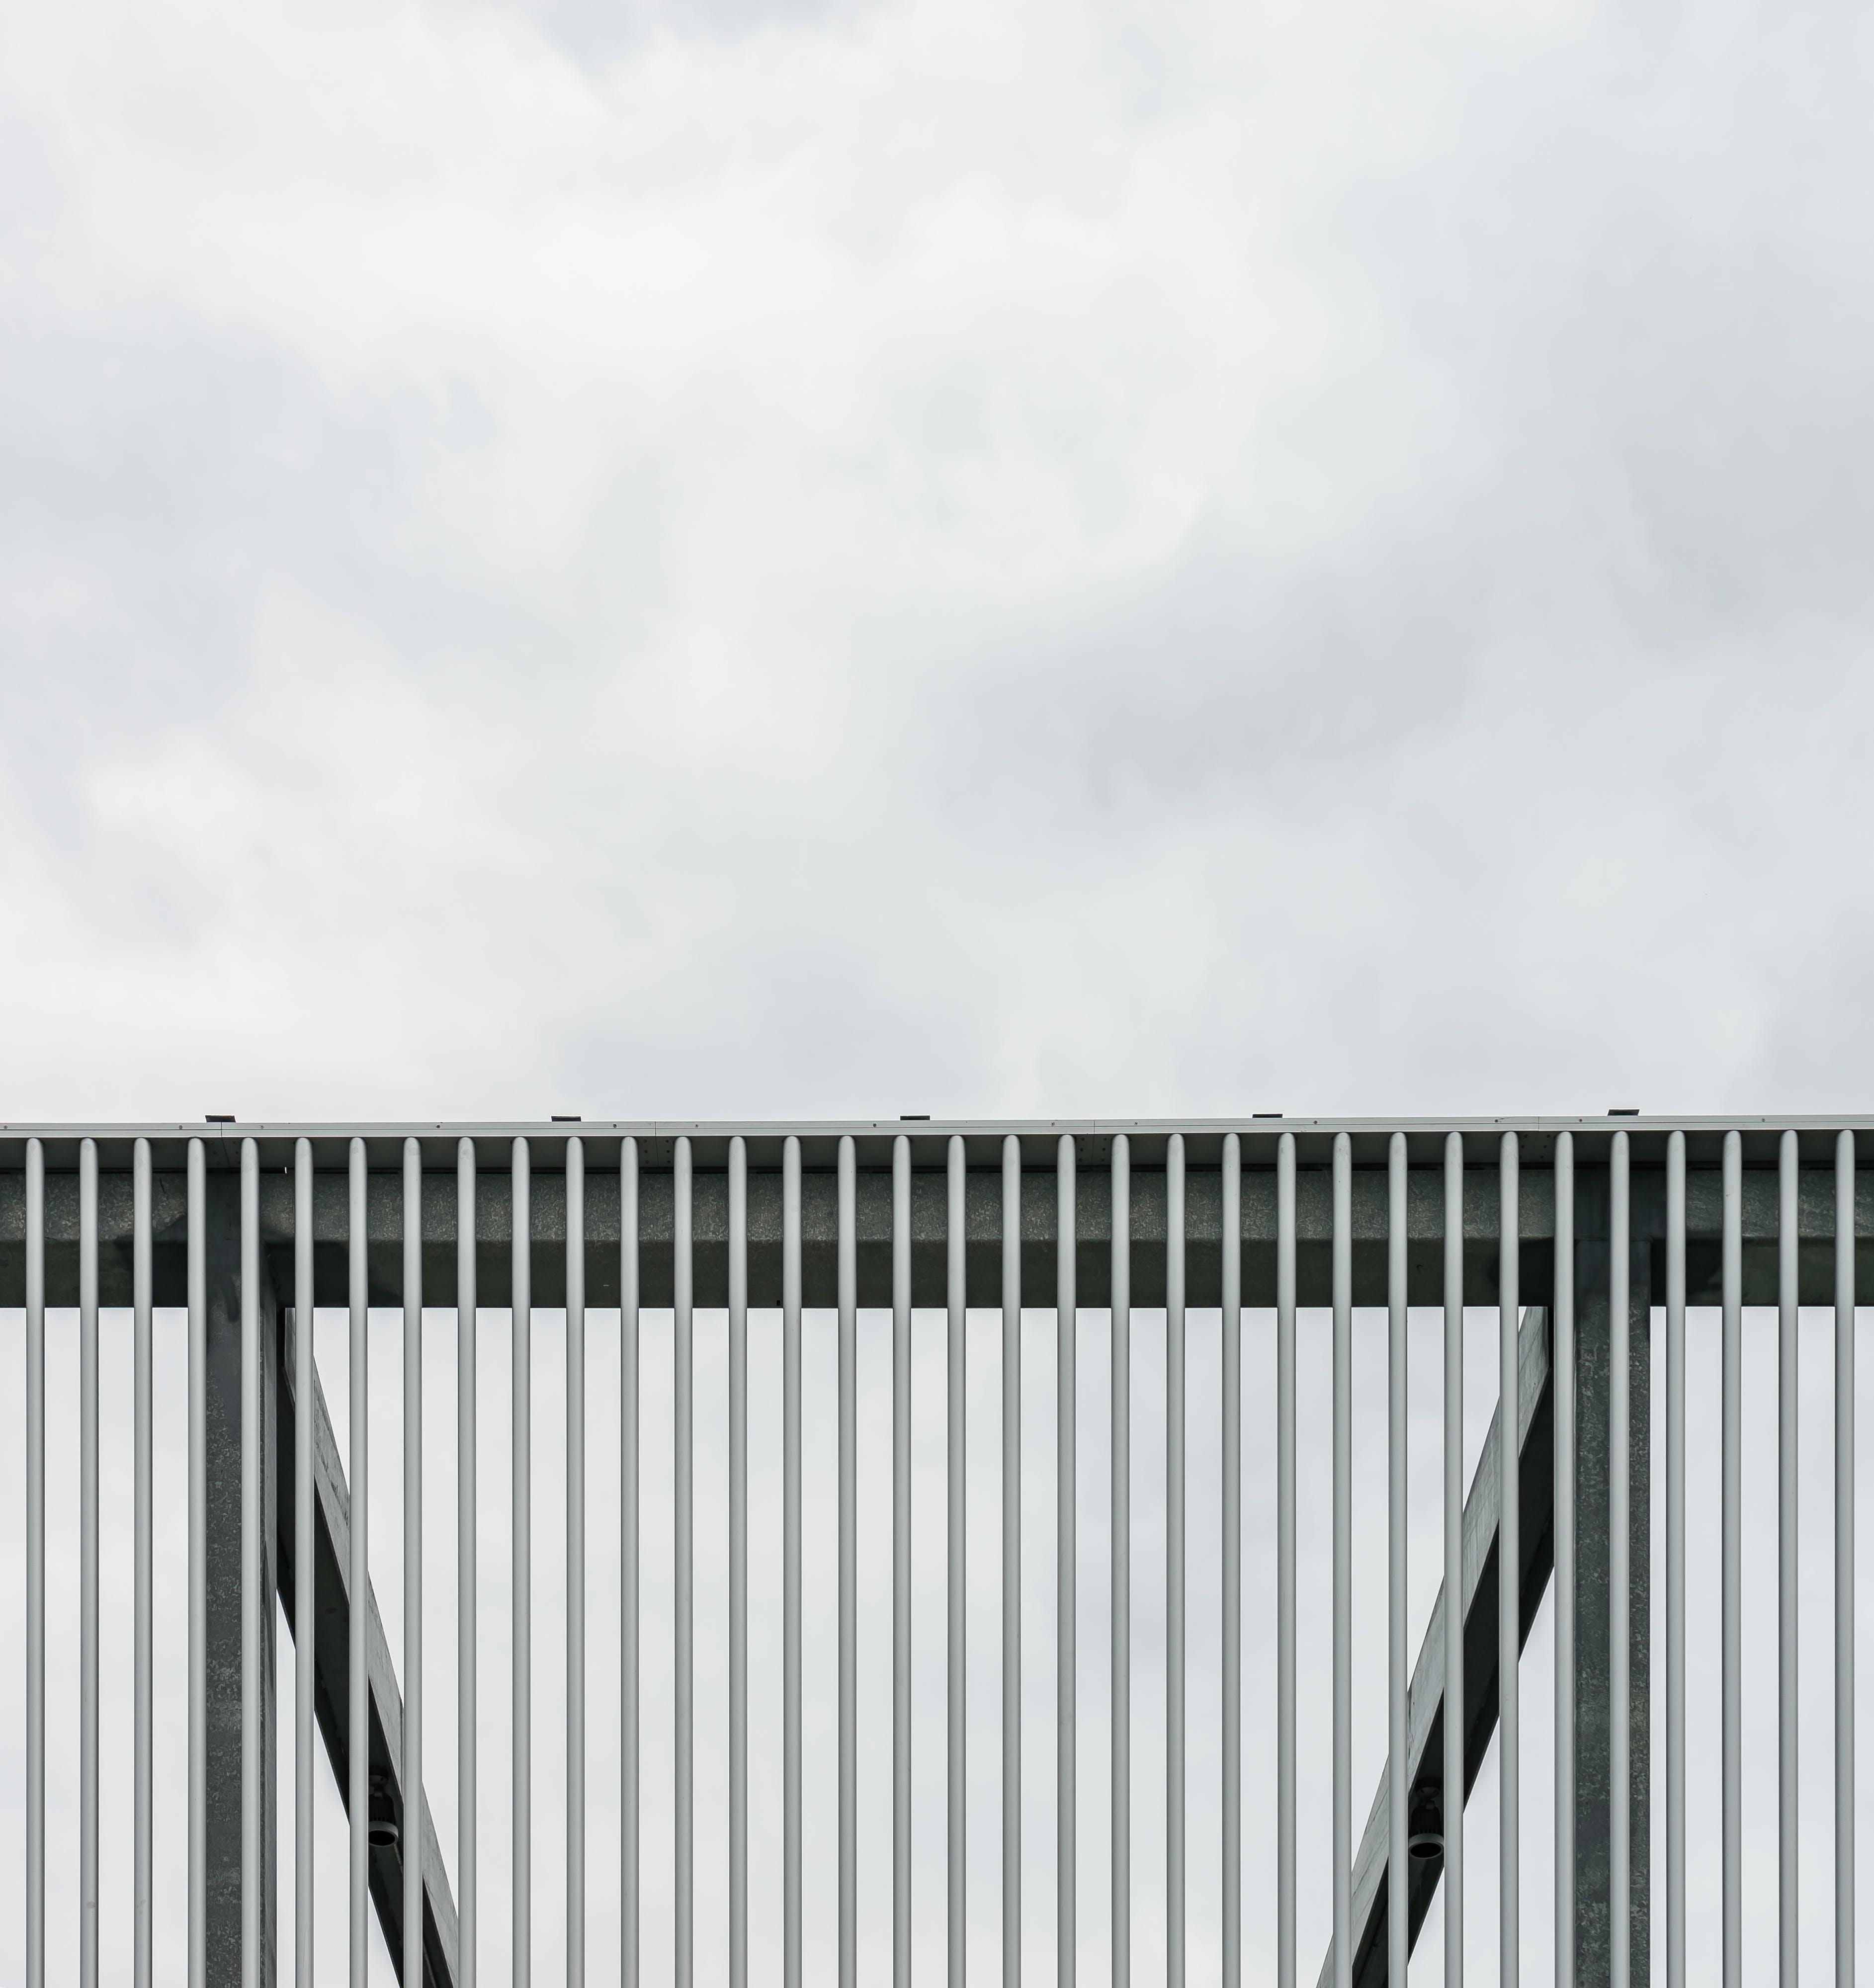 exterior, fence, iron